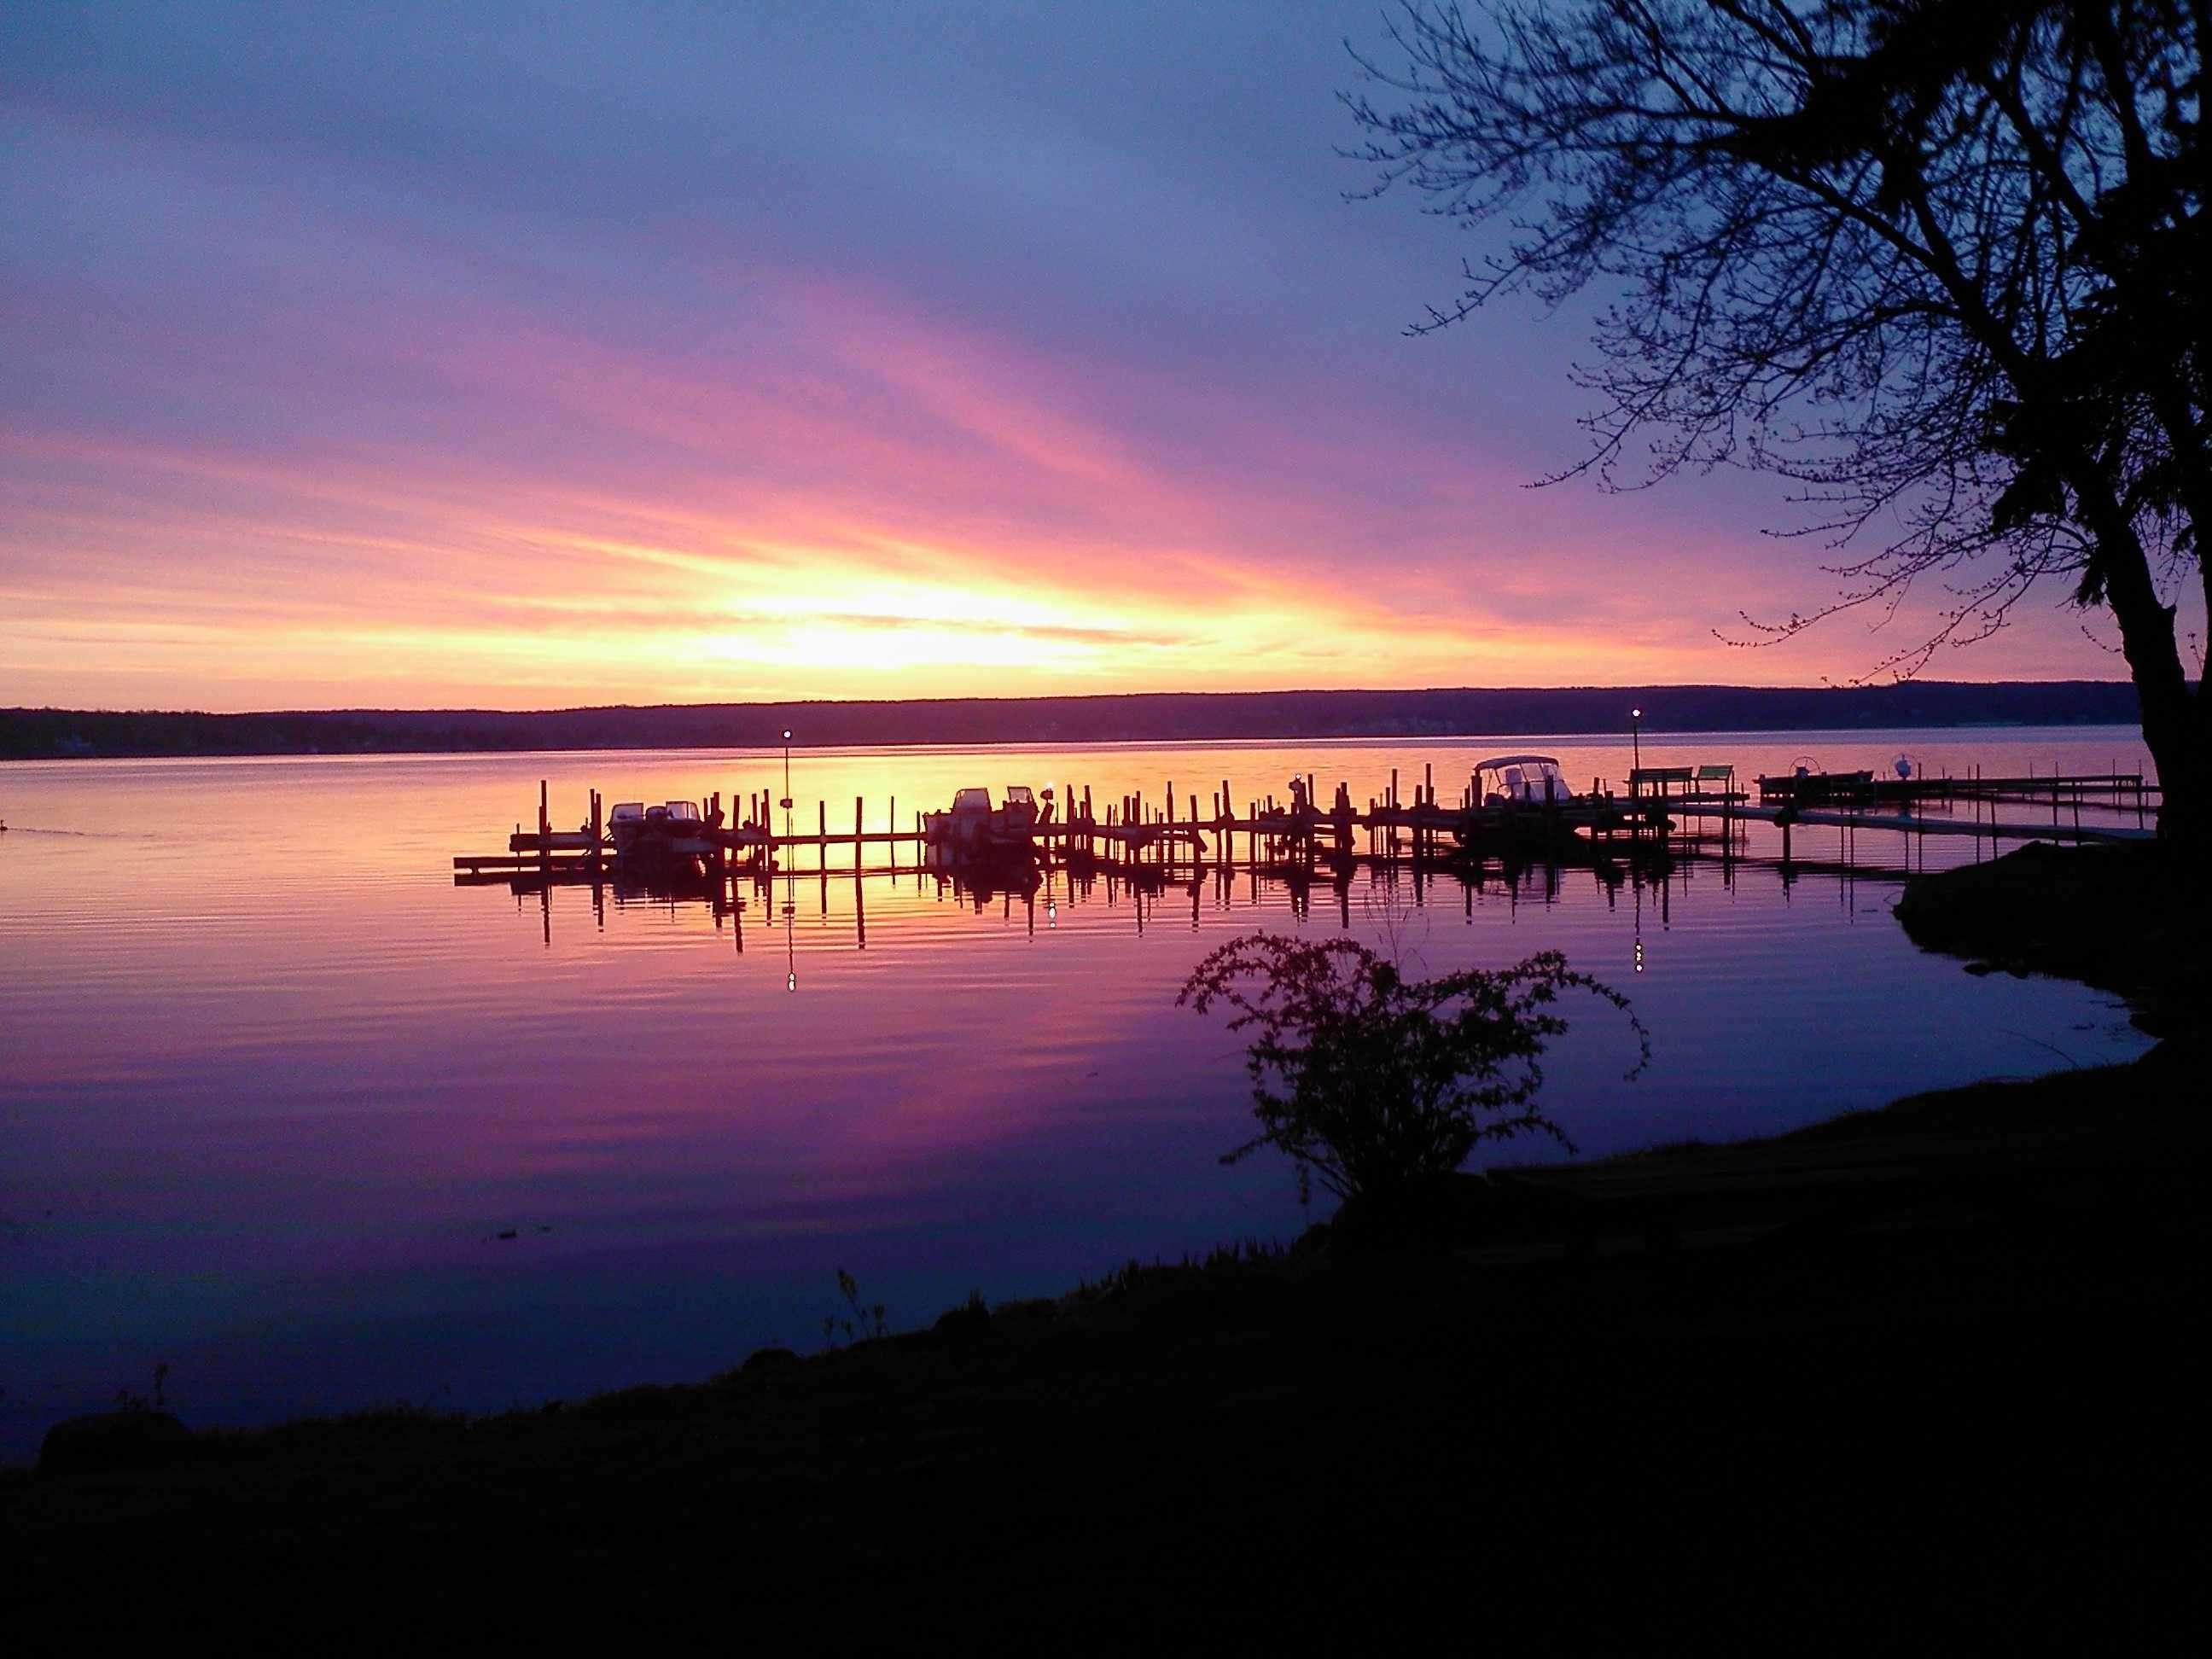 sunrise-2-from-Keith.jpg